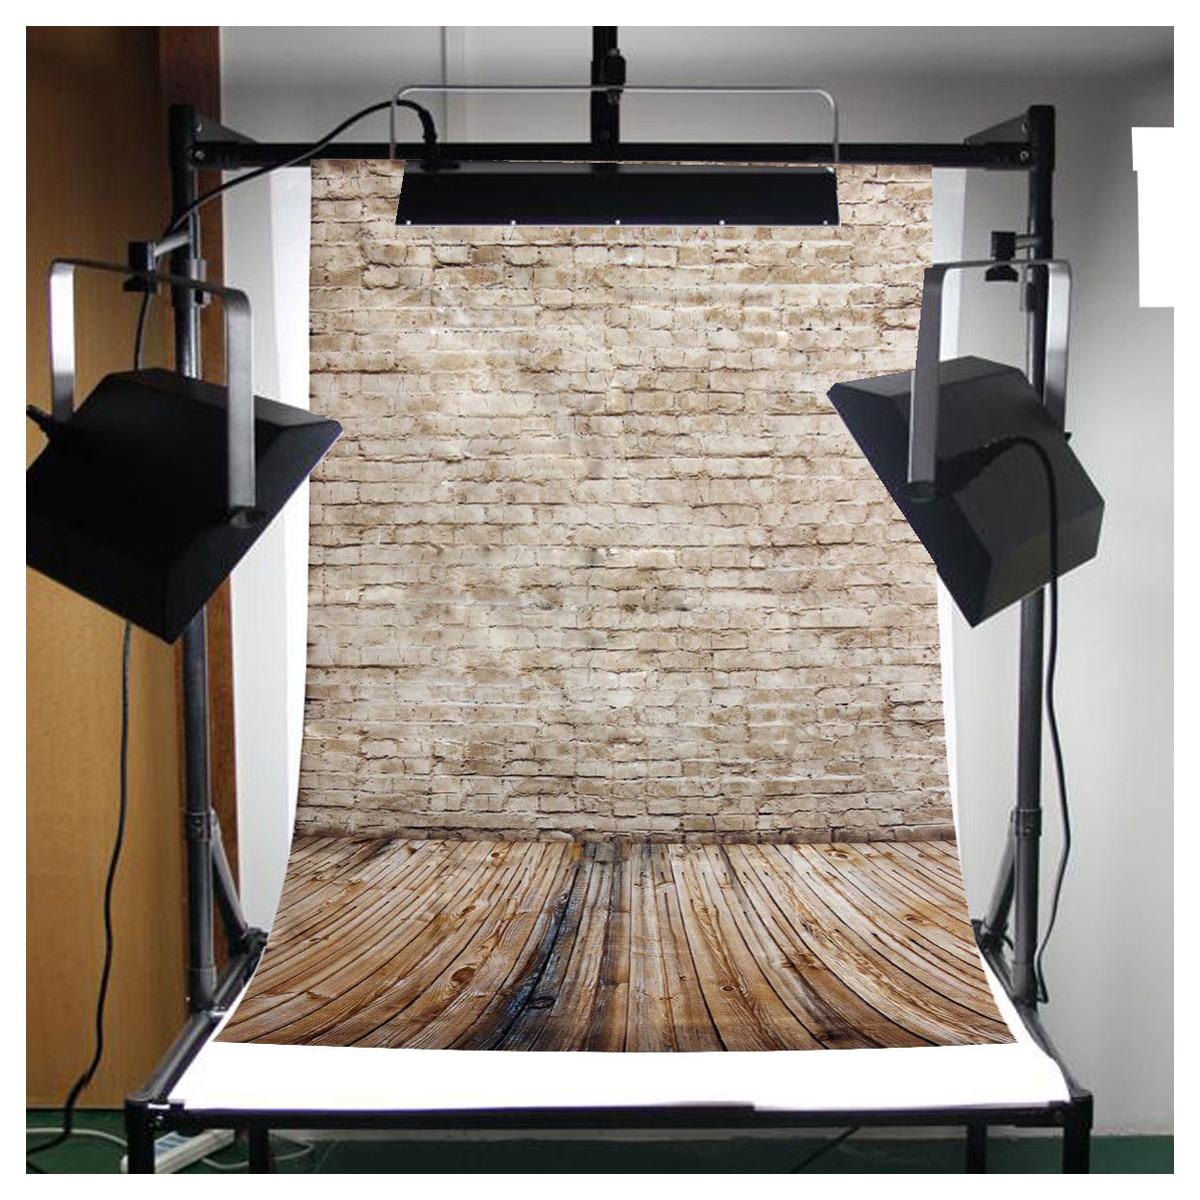 3x5ft flower wood wall vinyl background photography photo studio props - Etc 3x5ft Brick Wall Photography Backdrop Photo Wooden Floor Studio Background Props Light Grey